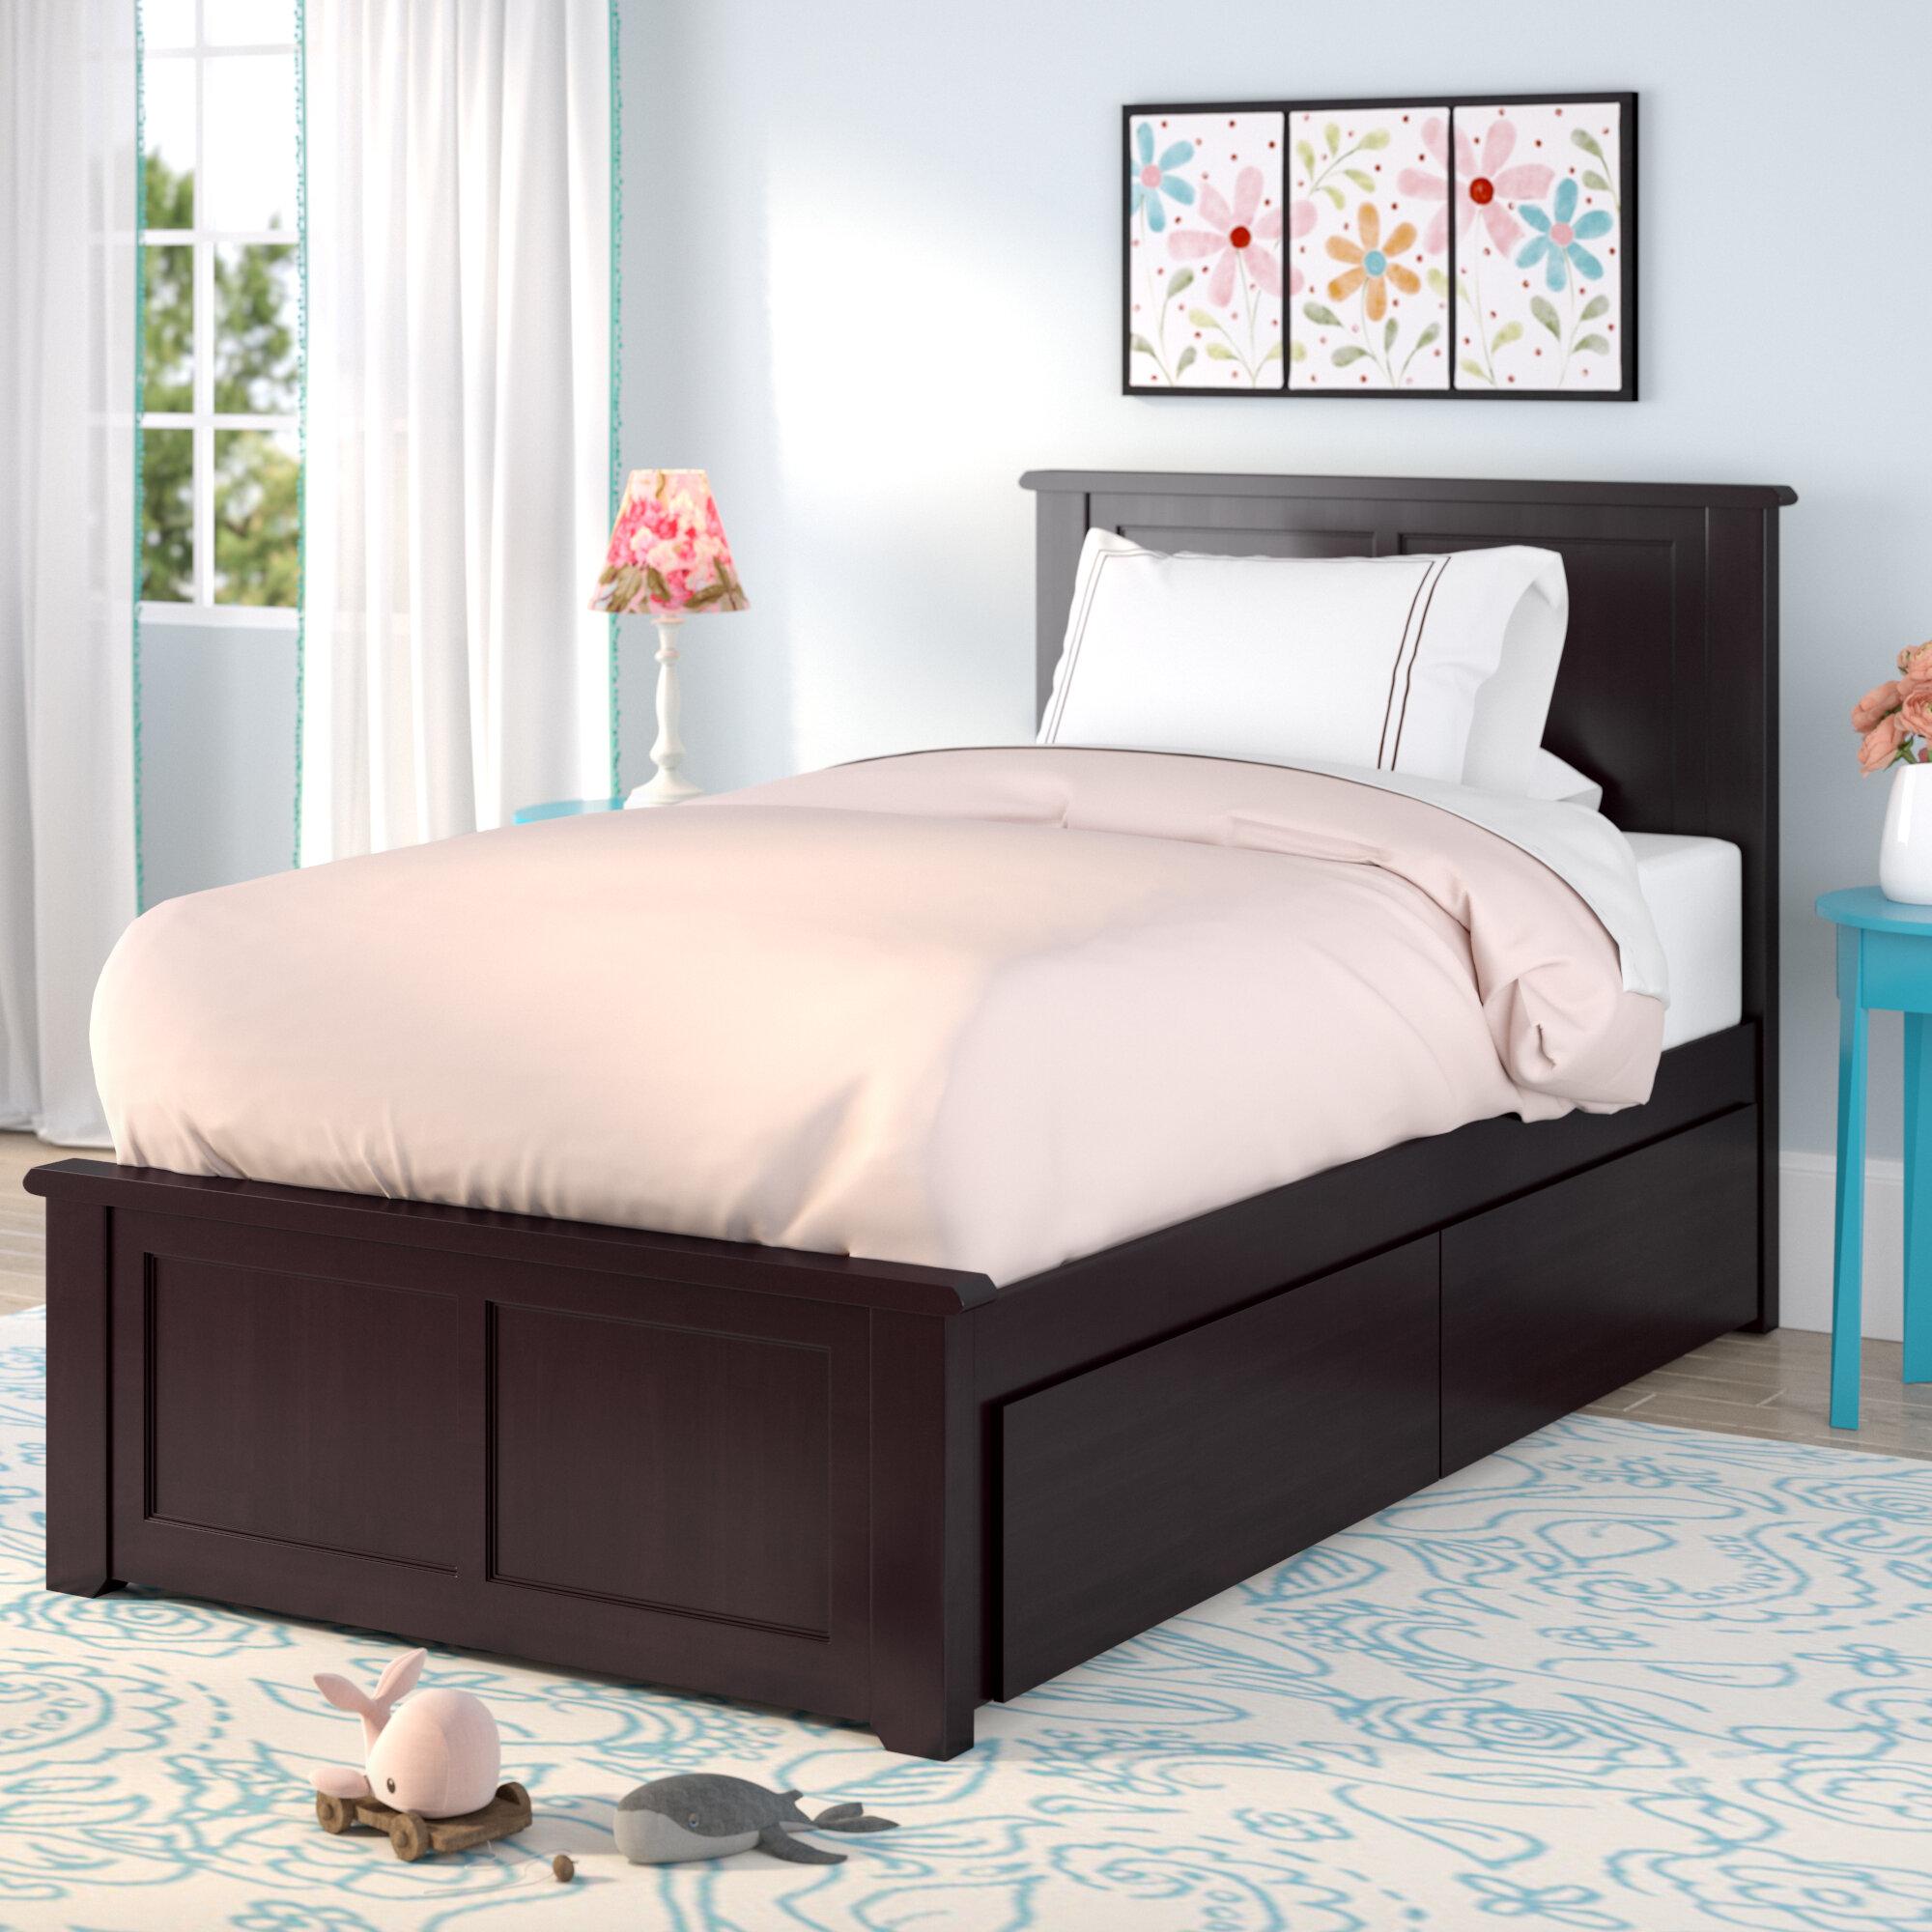 b49266ee2a6af Grovelane Teen Amir Platform Bed with Drawers   Reviews